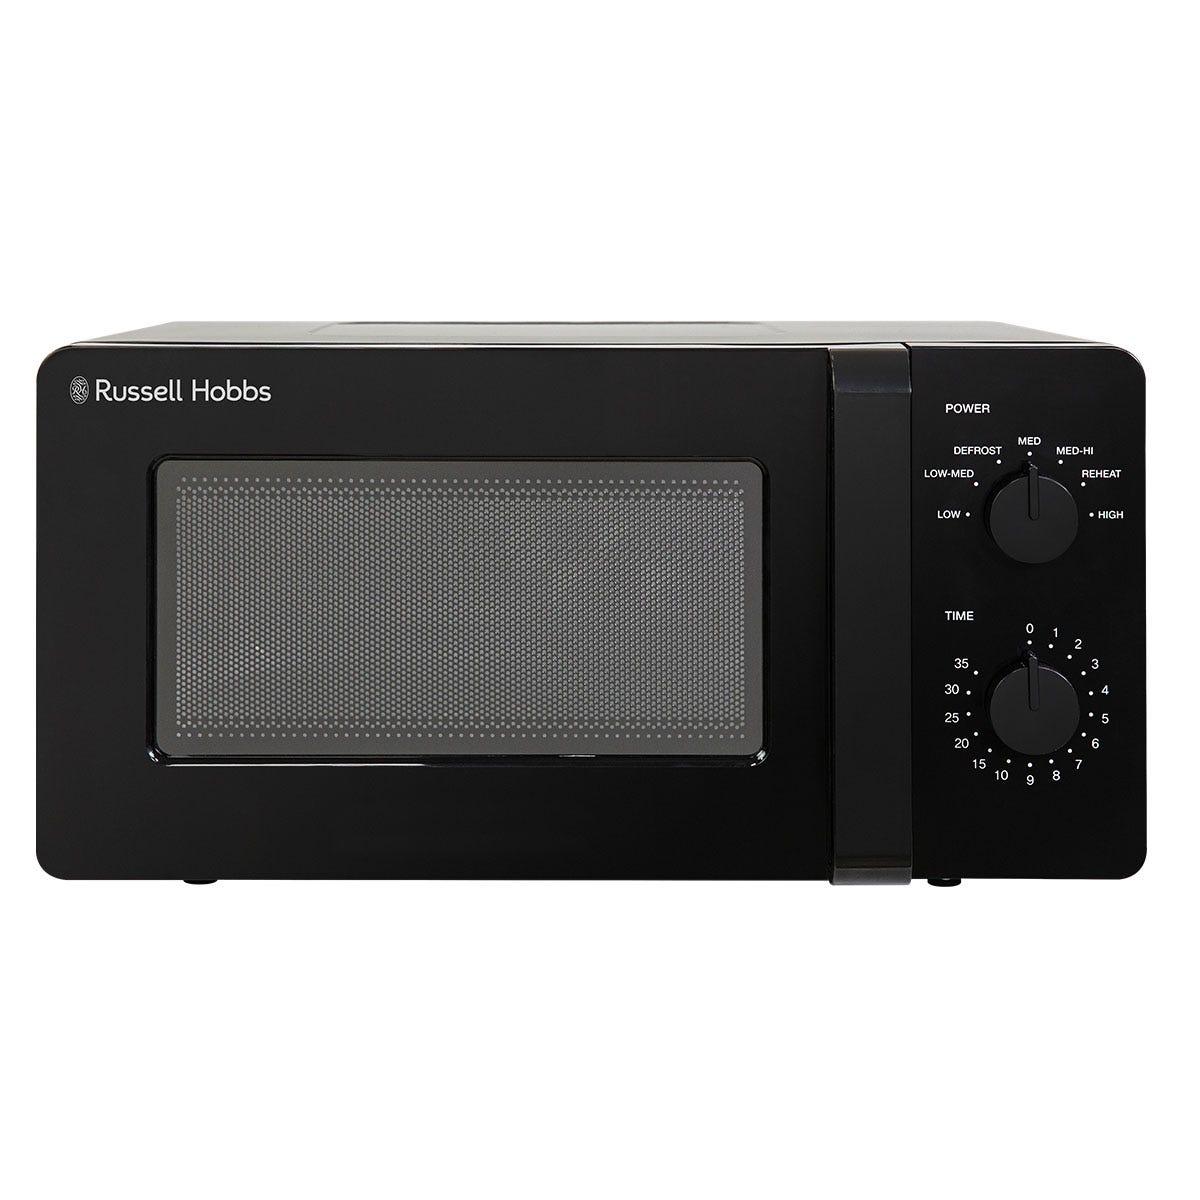 Russell Hobbs RHM1401B Ultra 14L 600W Manual Microwave - Black